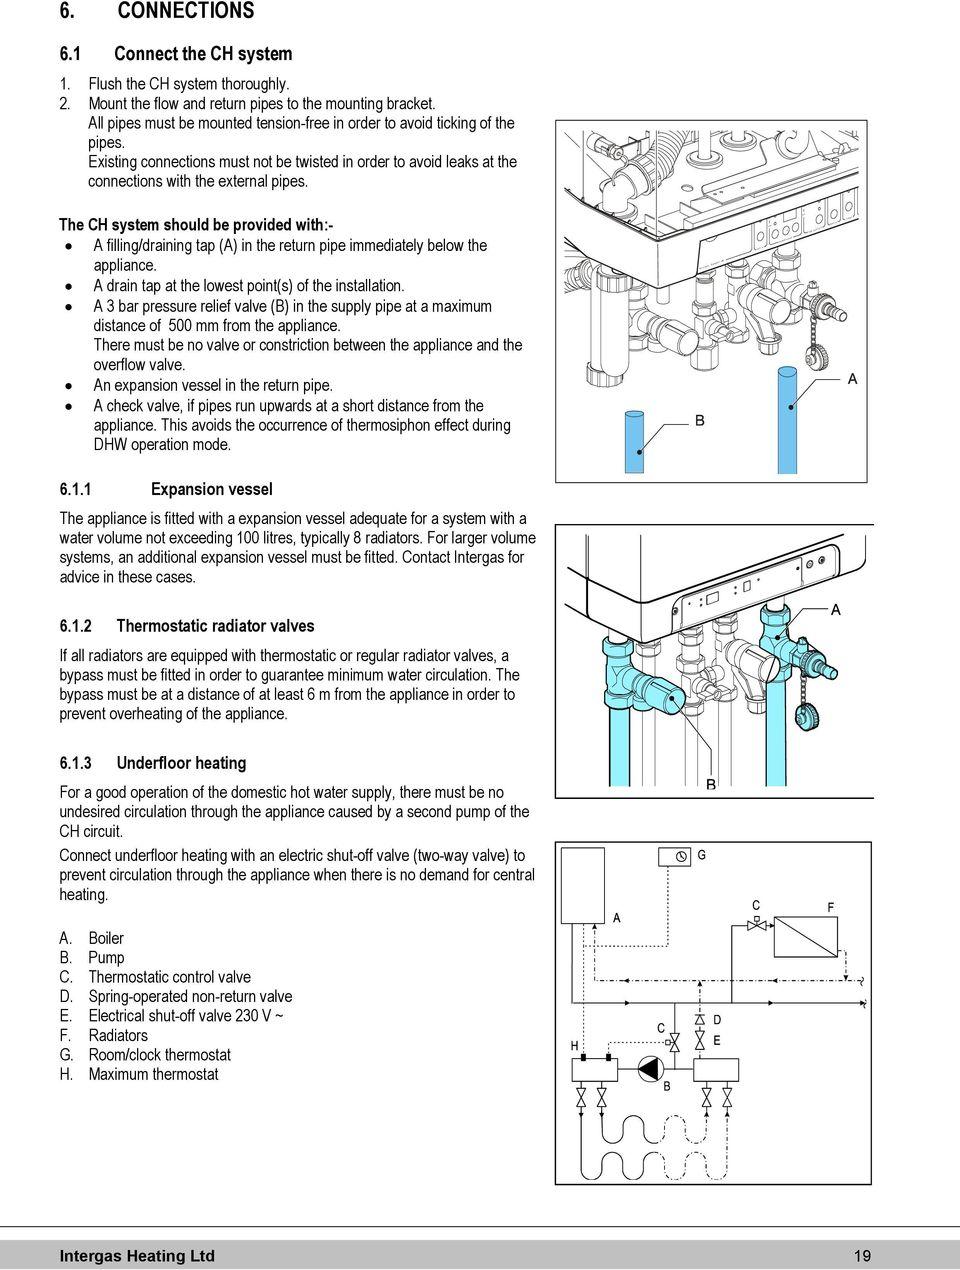 DE_5013] Wickes Underfloor Heating Thermostat Wiring Diagram Free Diagram | Wickes Underfloor Heating Wiring Diagram |  | Eachi Aidew Illuminateatx Librar Wiring 101